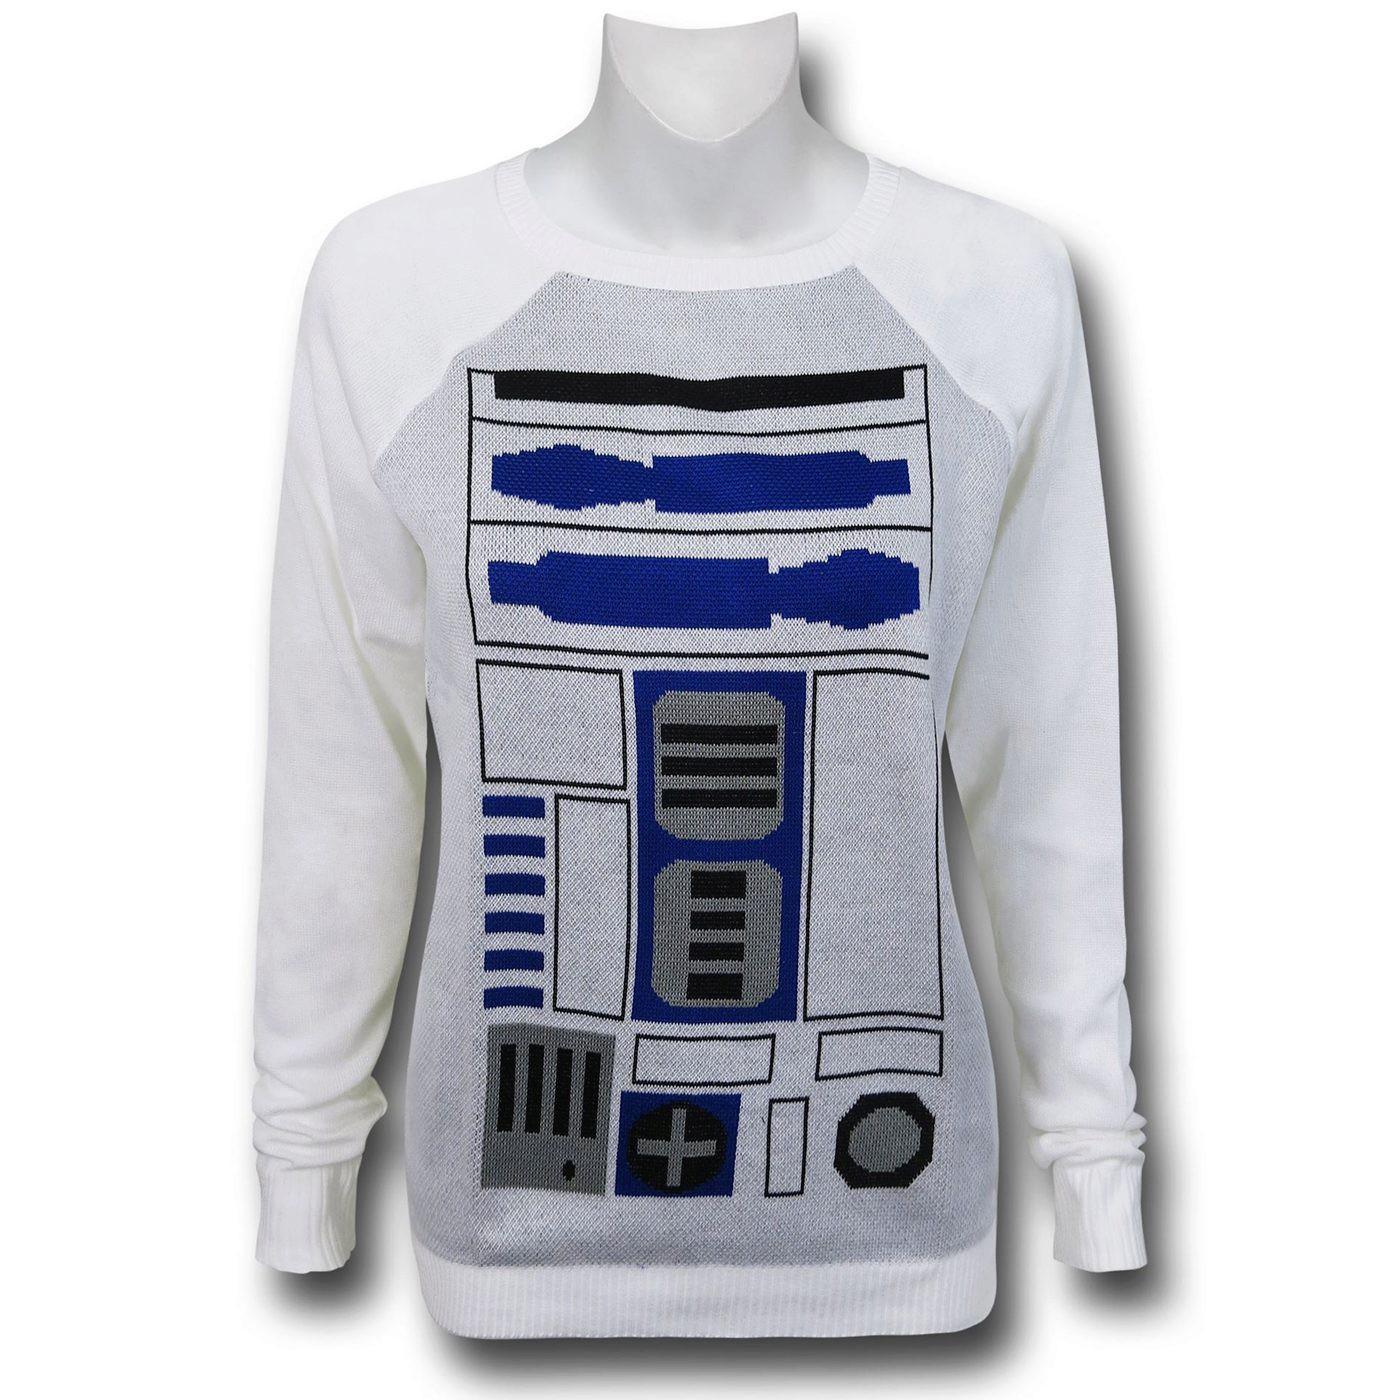 Star Wars R2D2 Women's Costume Sweater